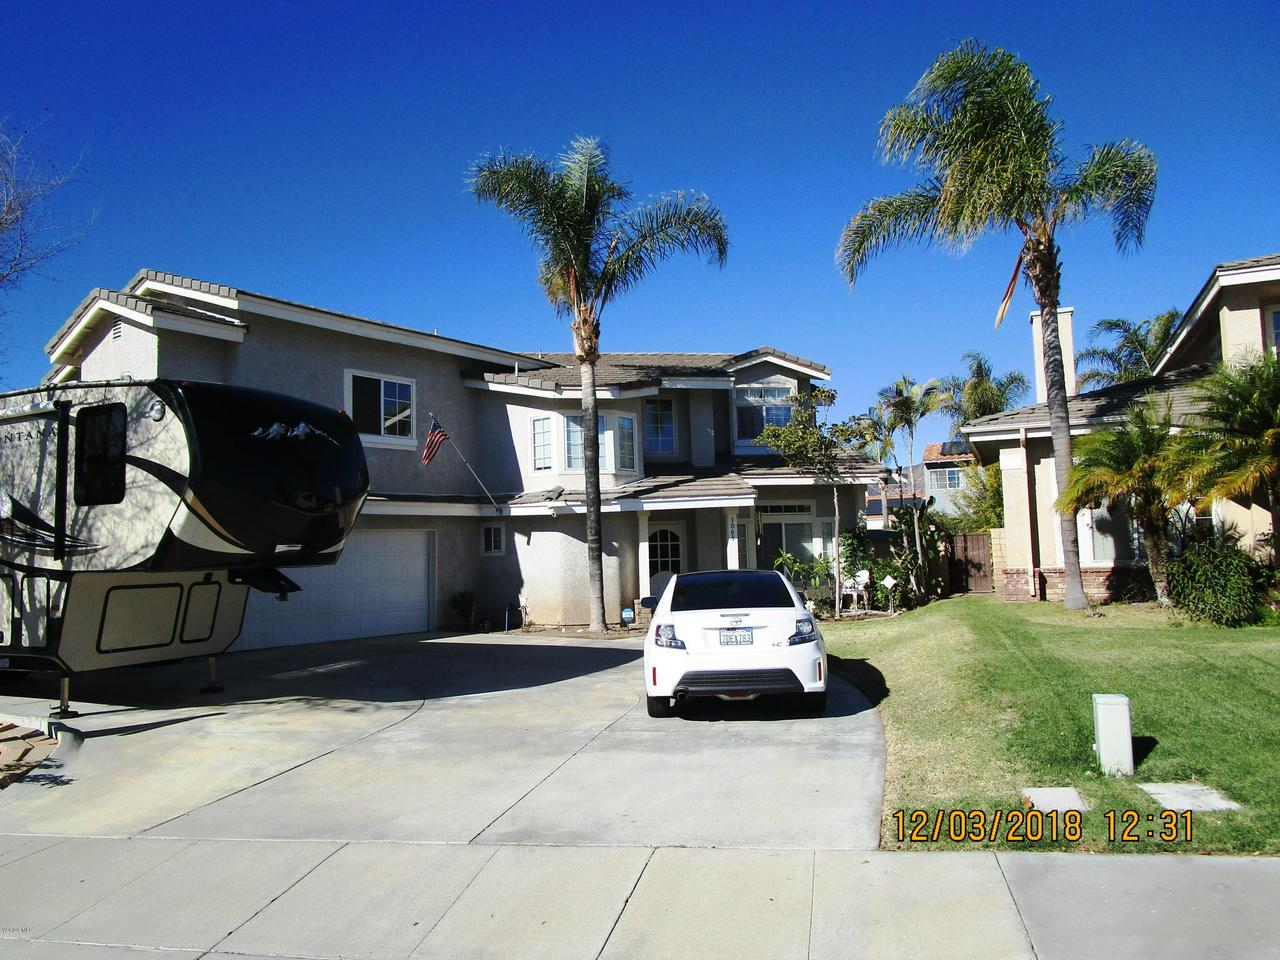 1063 MEADOWLARK, Fillmore, CA 93015 - front